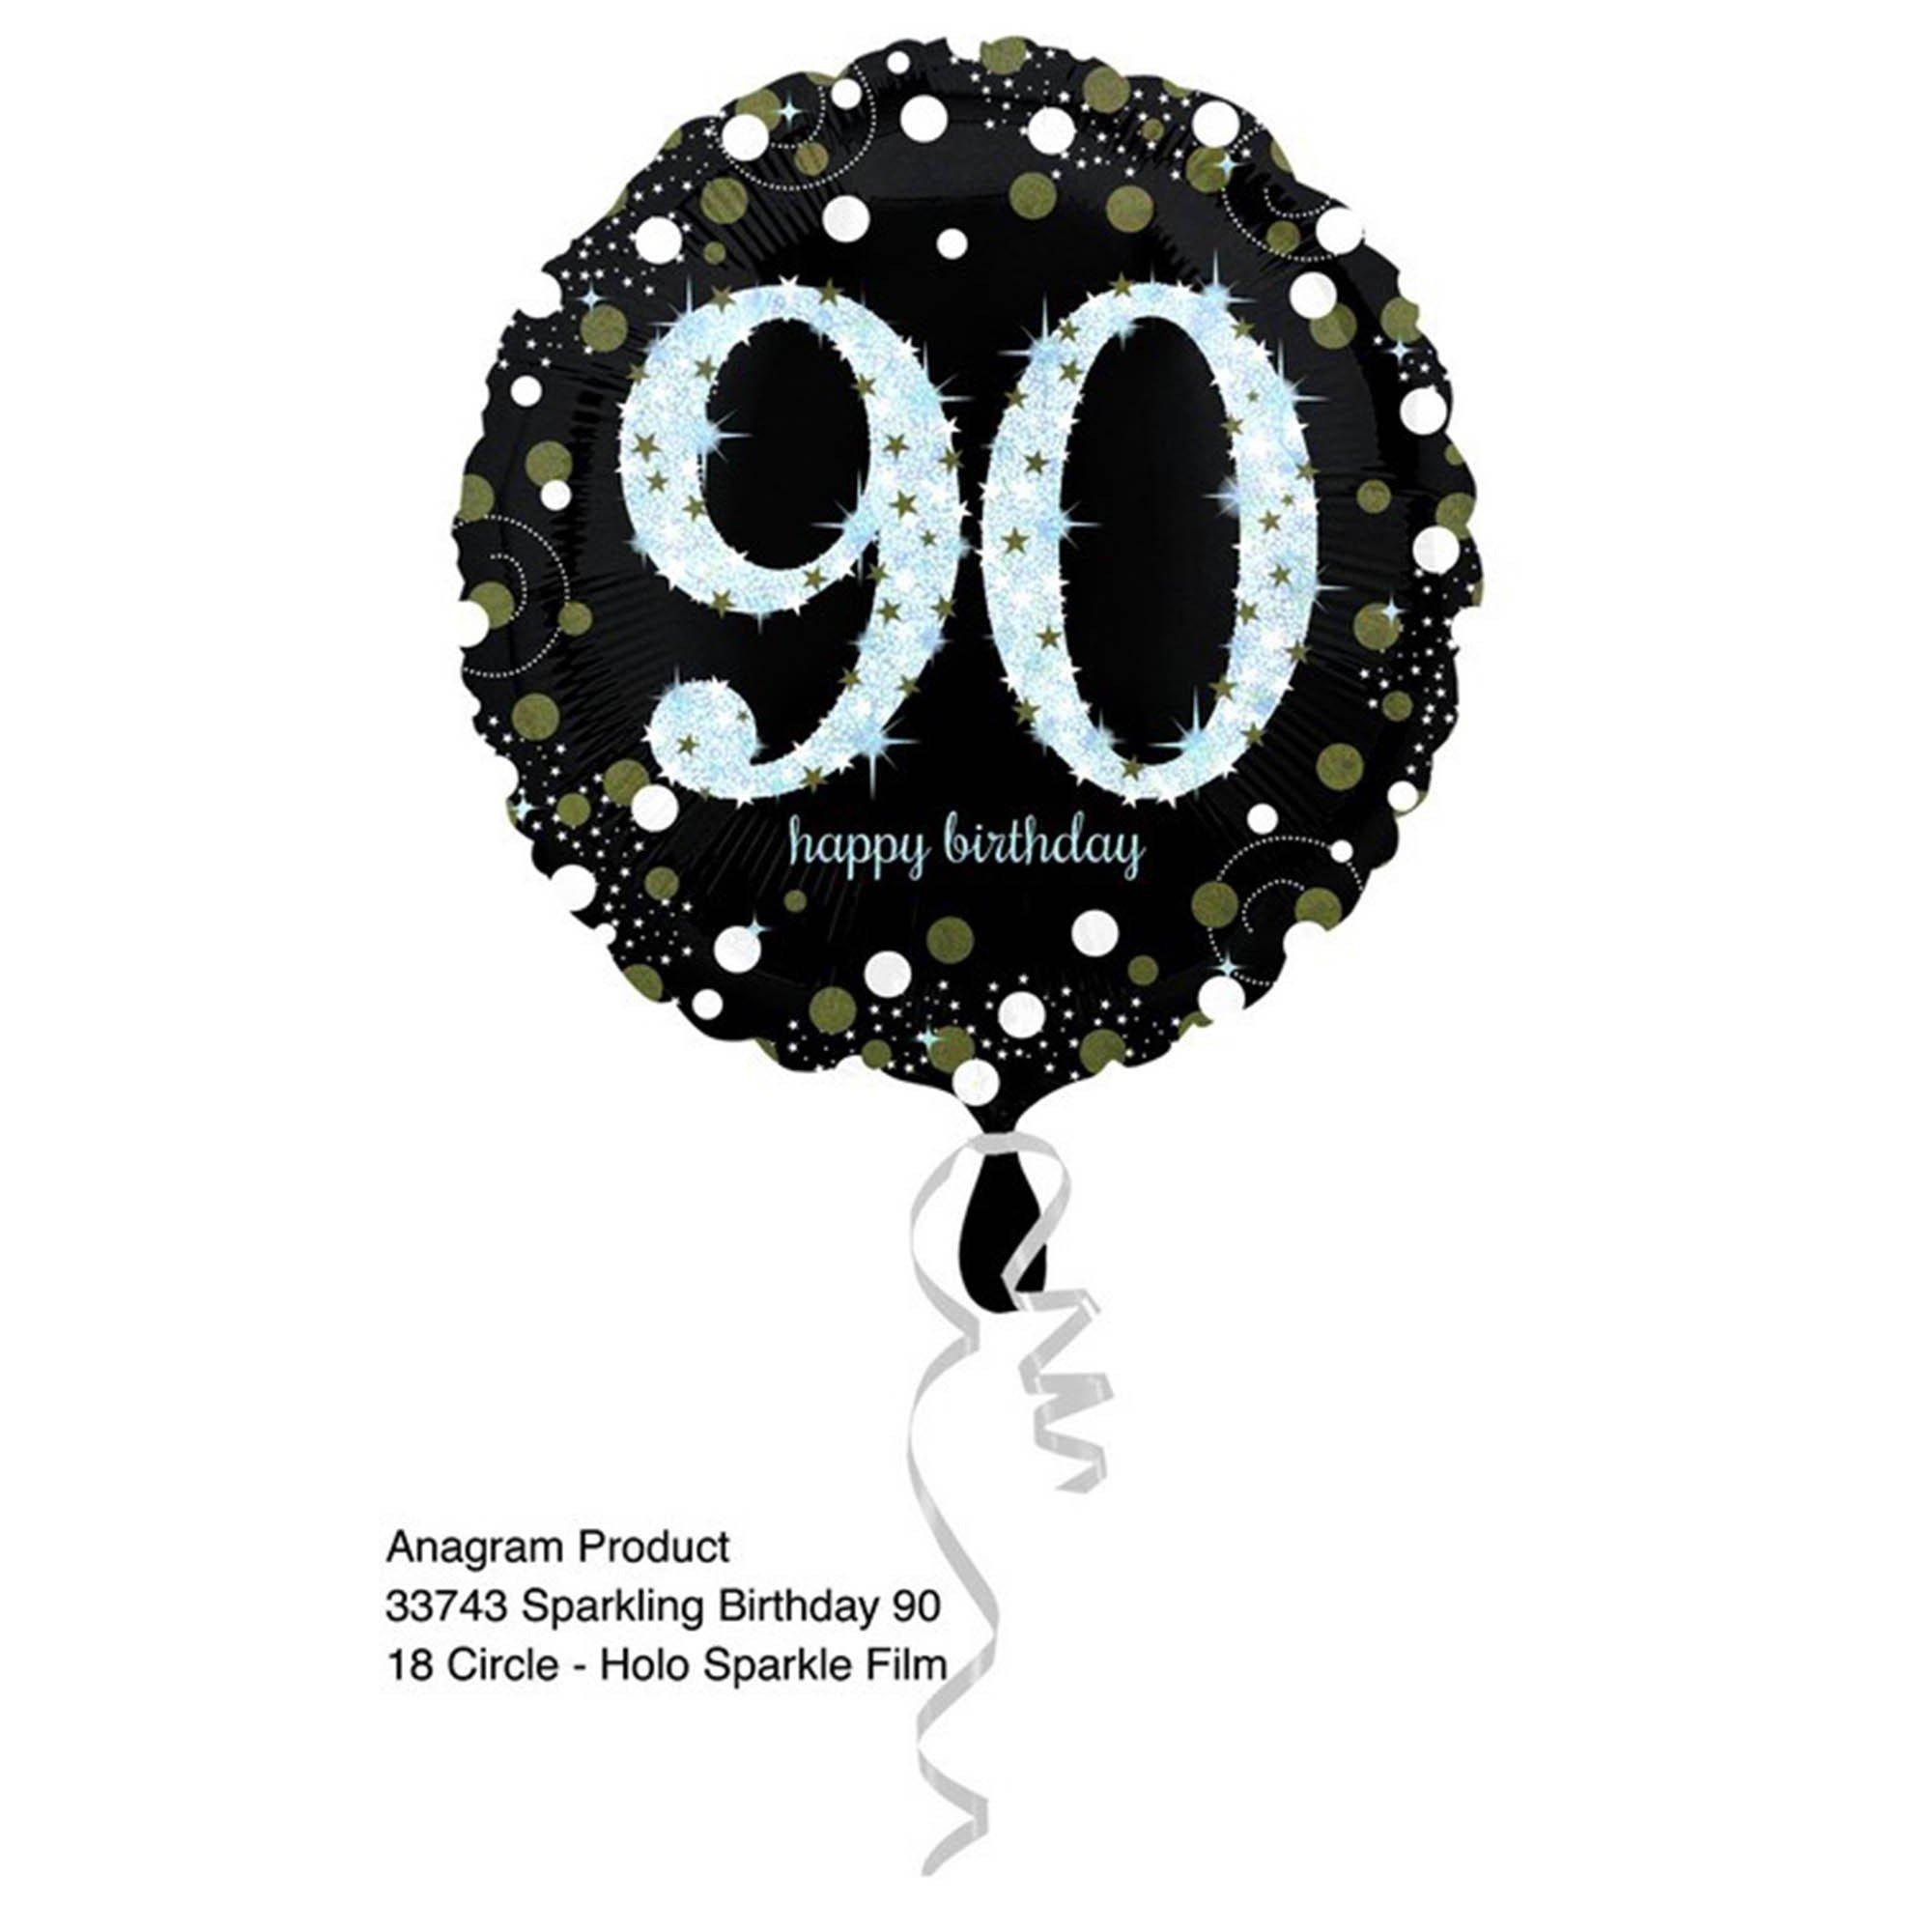 45cm Standard Holographic Sparkling Birthday 90 S55